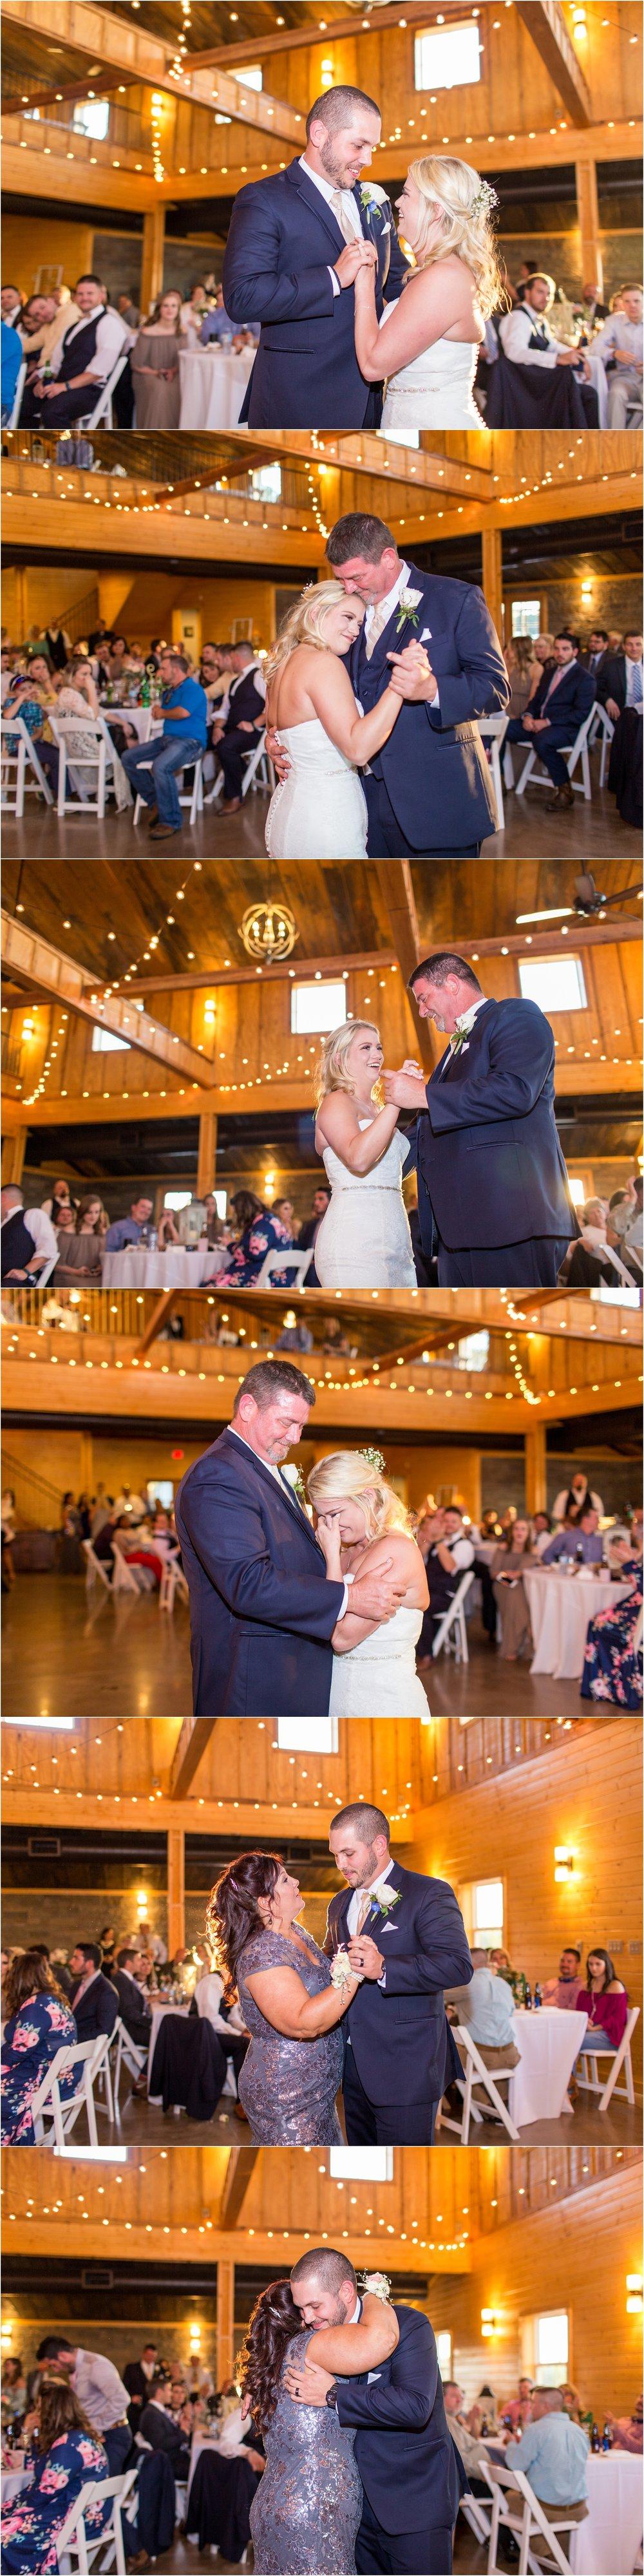 Savannah Eve Photography- Wade Wedding-61.jpg